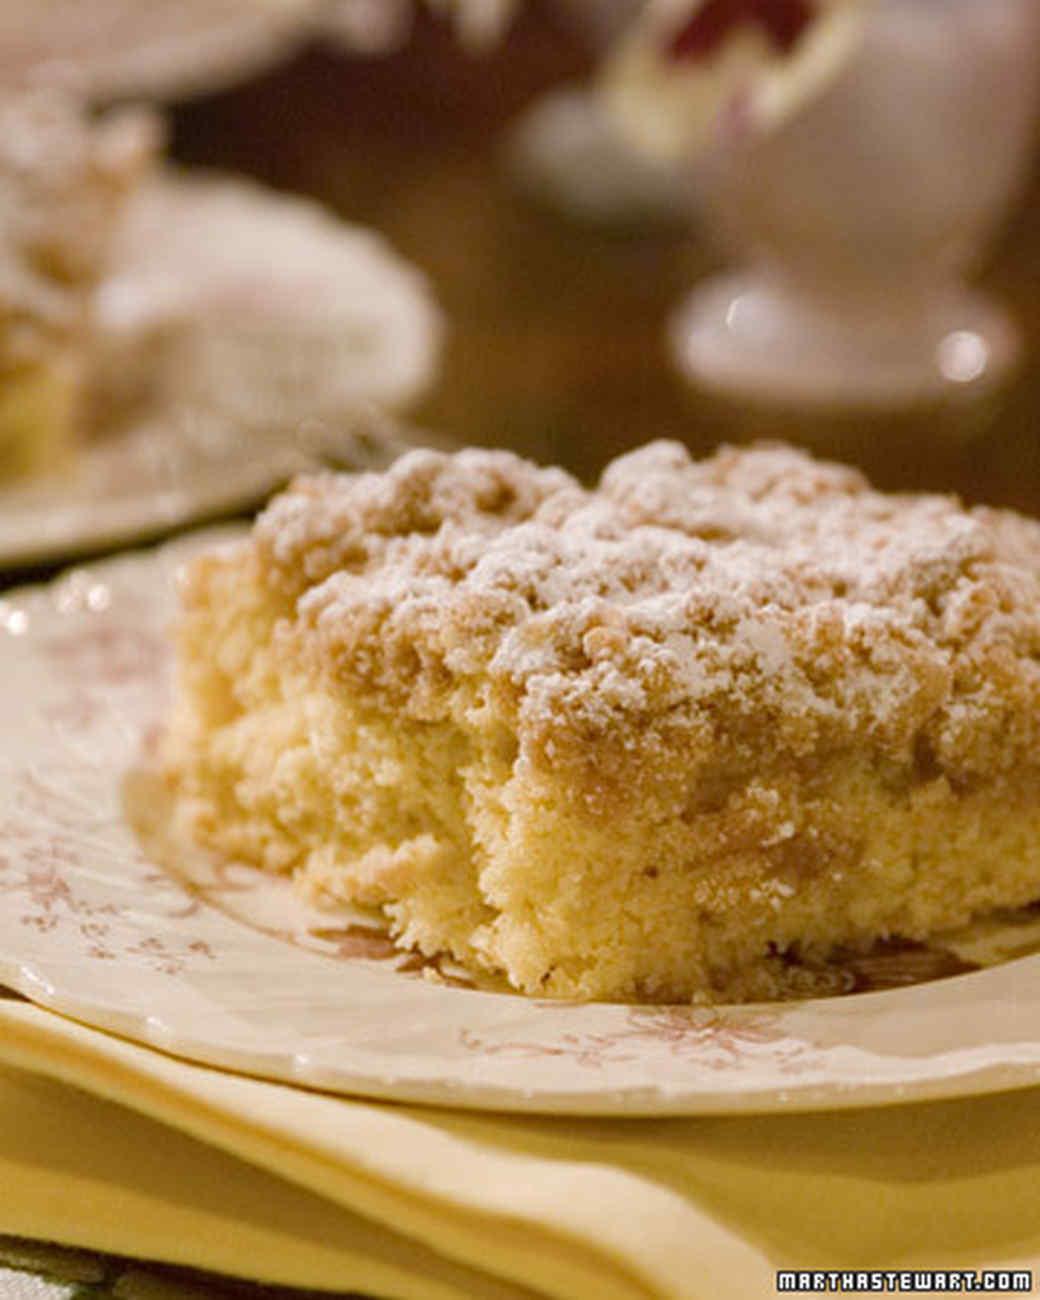 cakes_01138.jpg